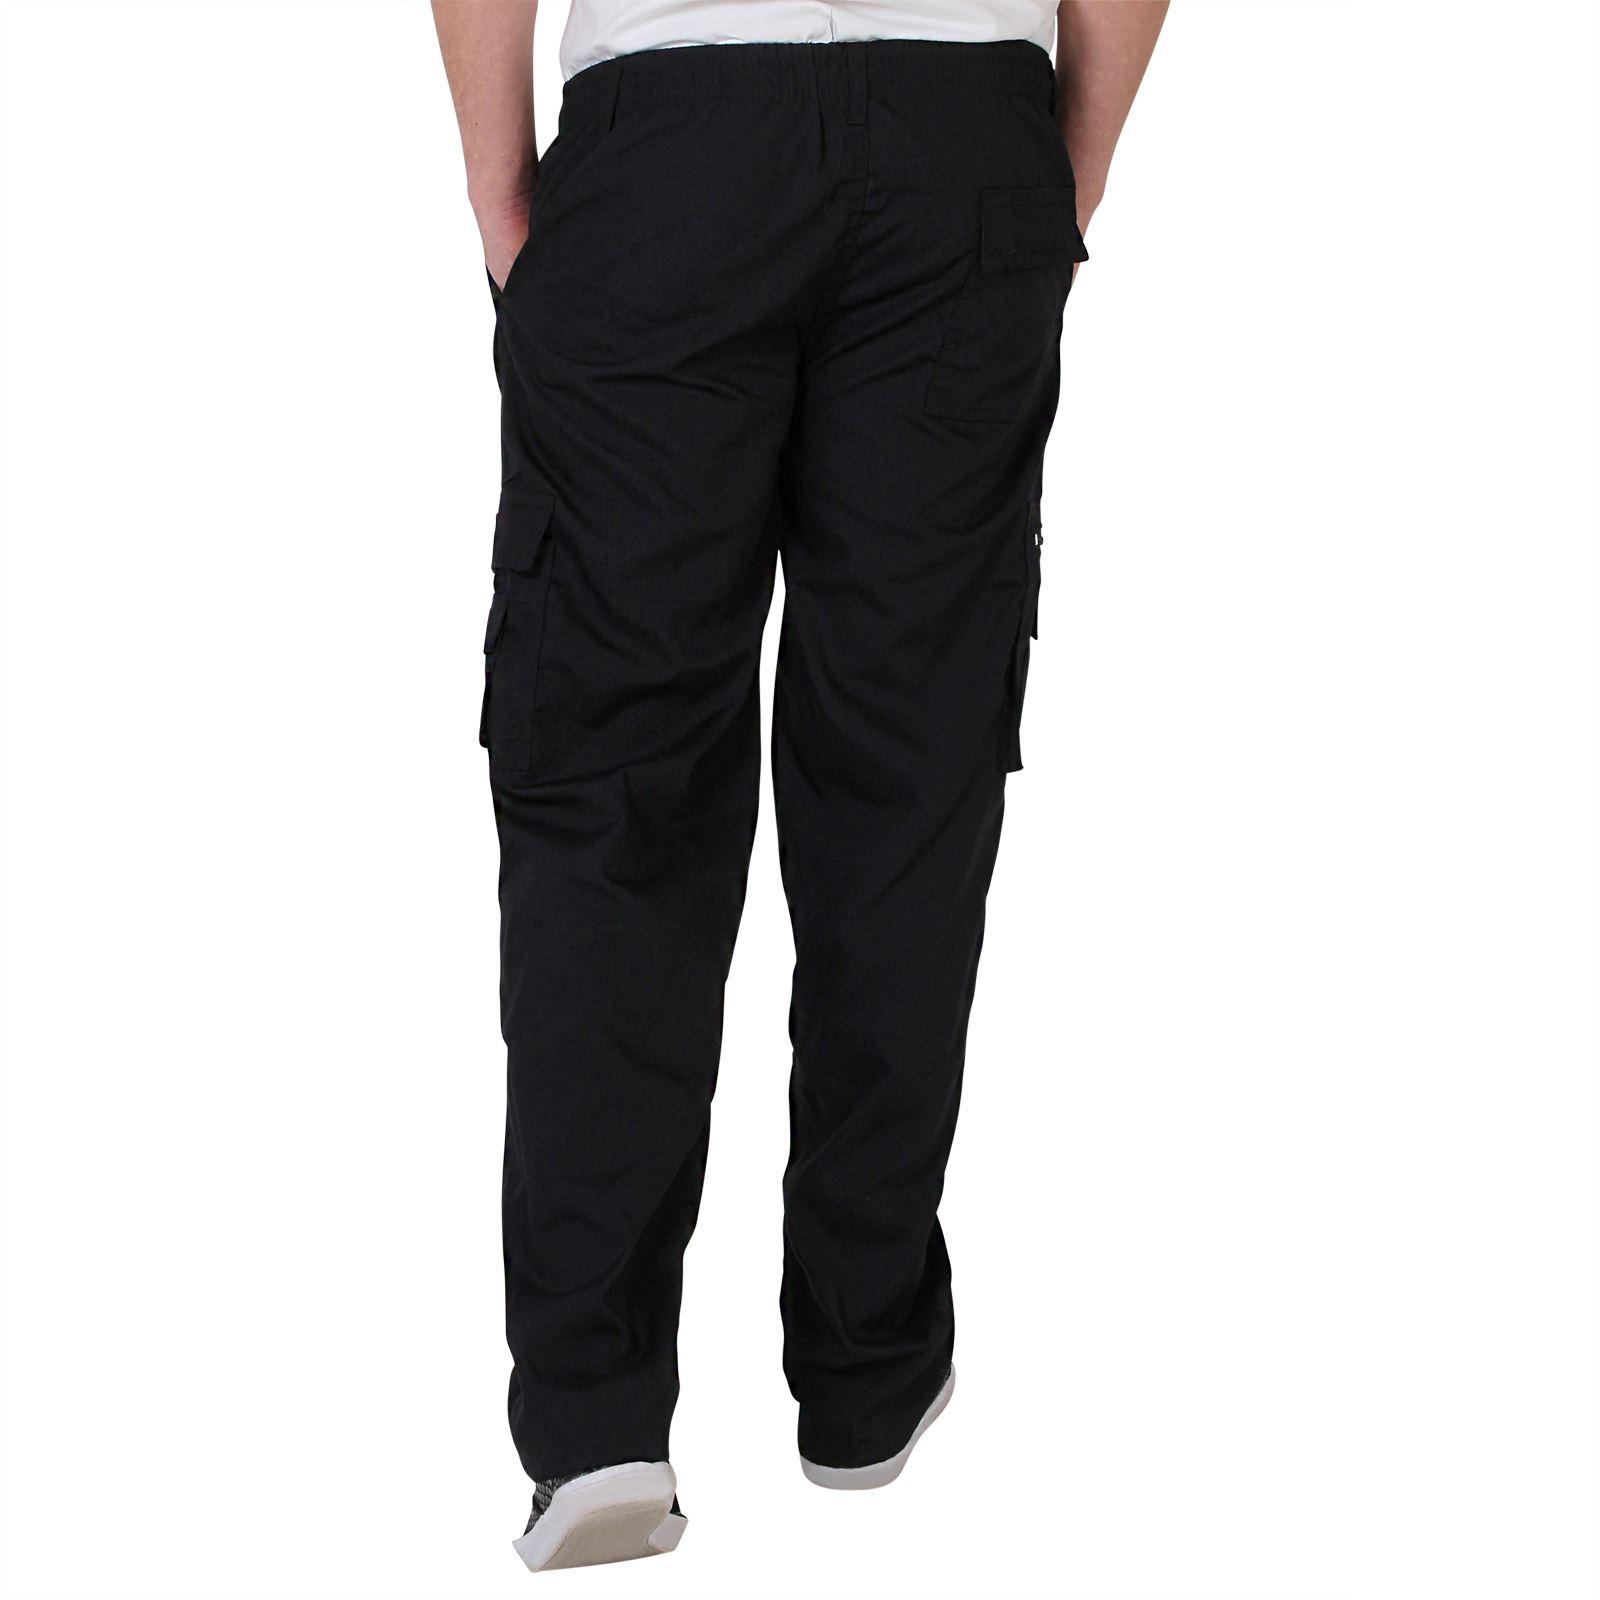 Pantalones-Hombre-Estilo-Cargo-Militar-Combate-Multibolsillos-Casual miniatura 31